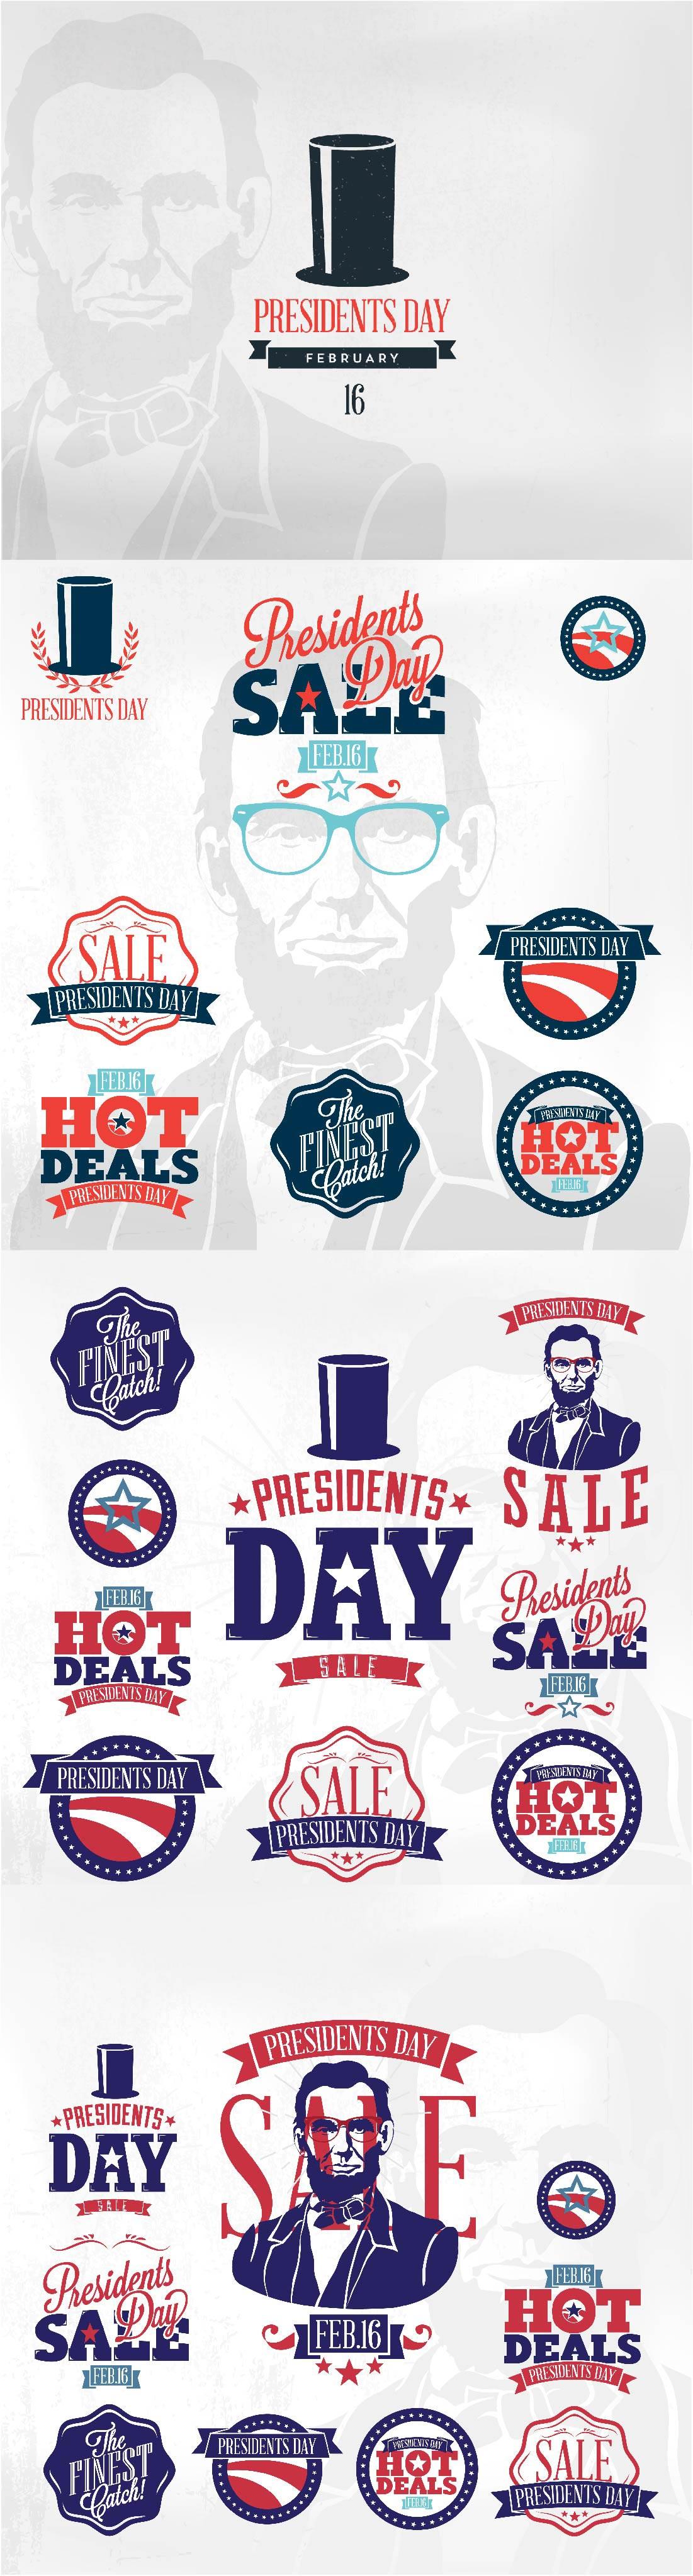 12presidents-day